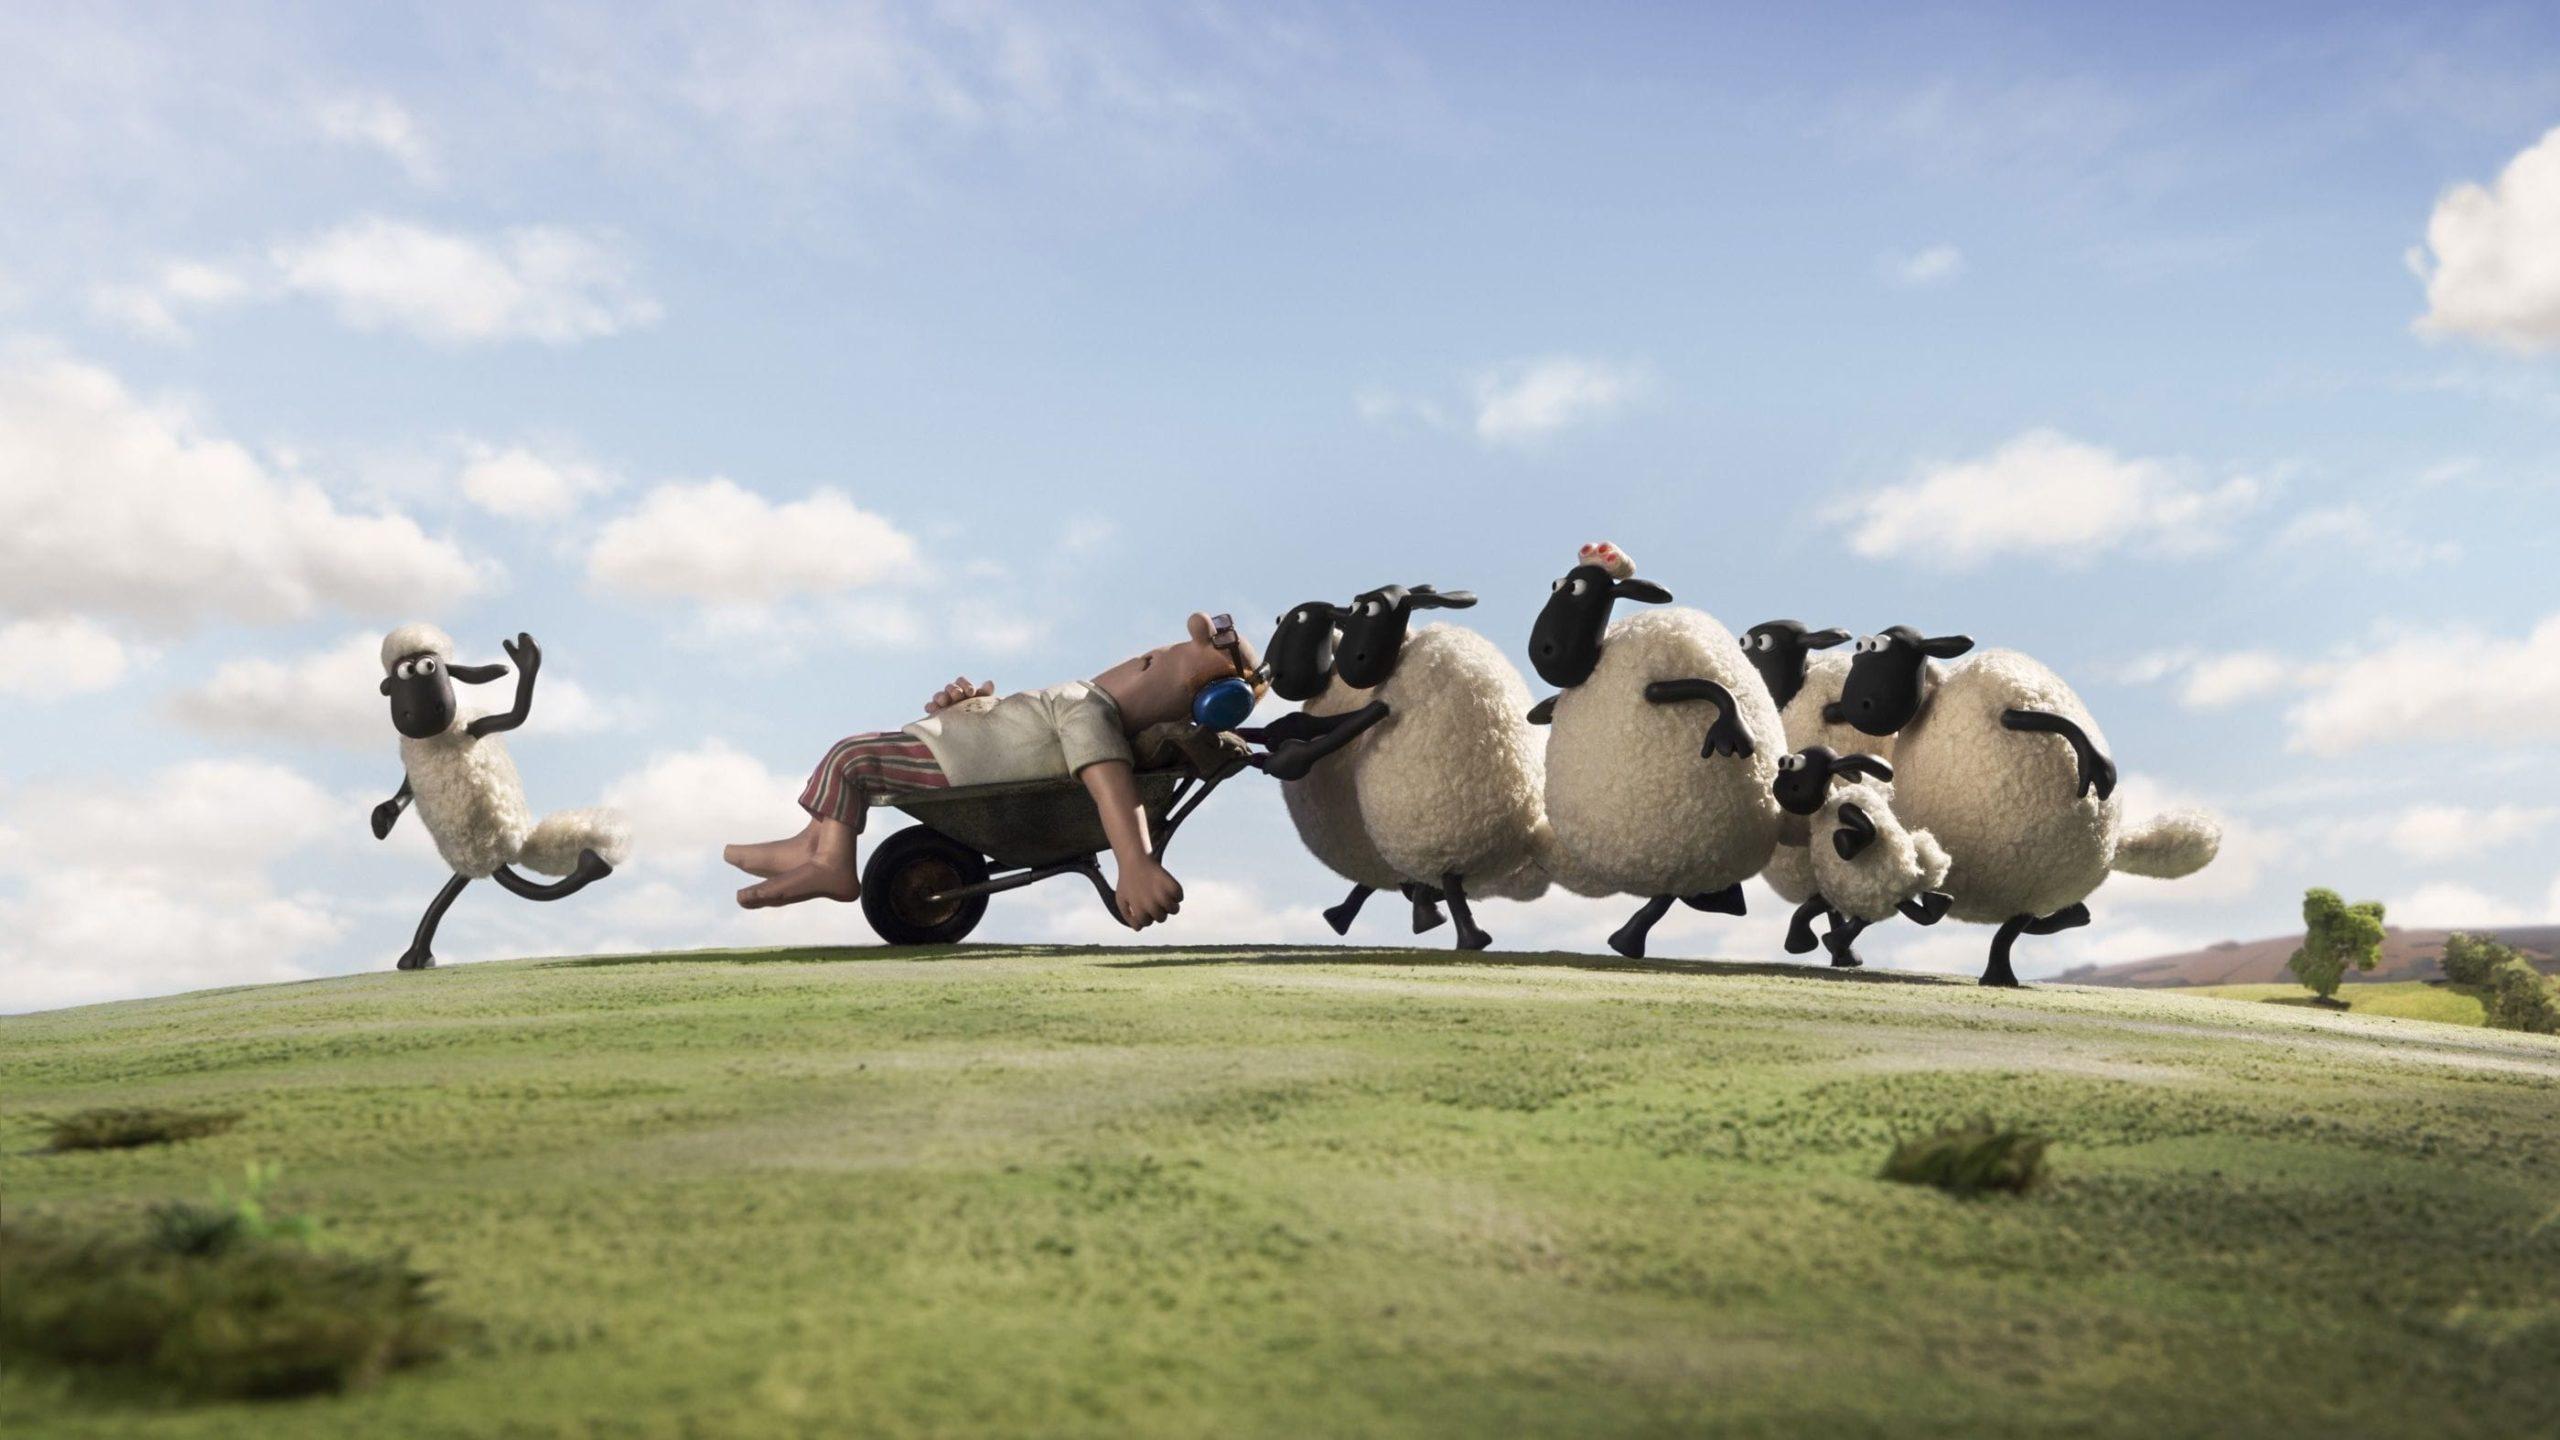 Shaun the Sheep Movie backdrop